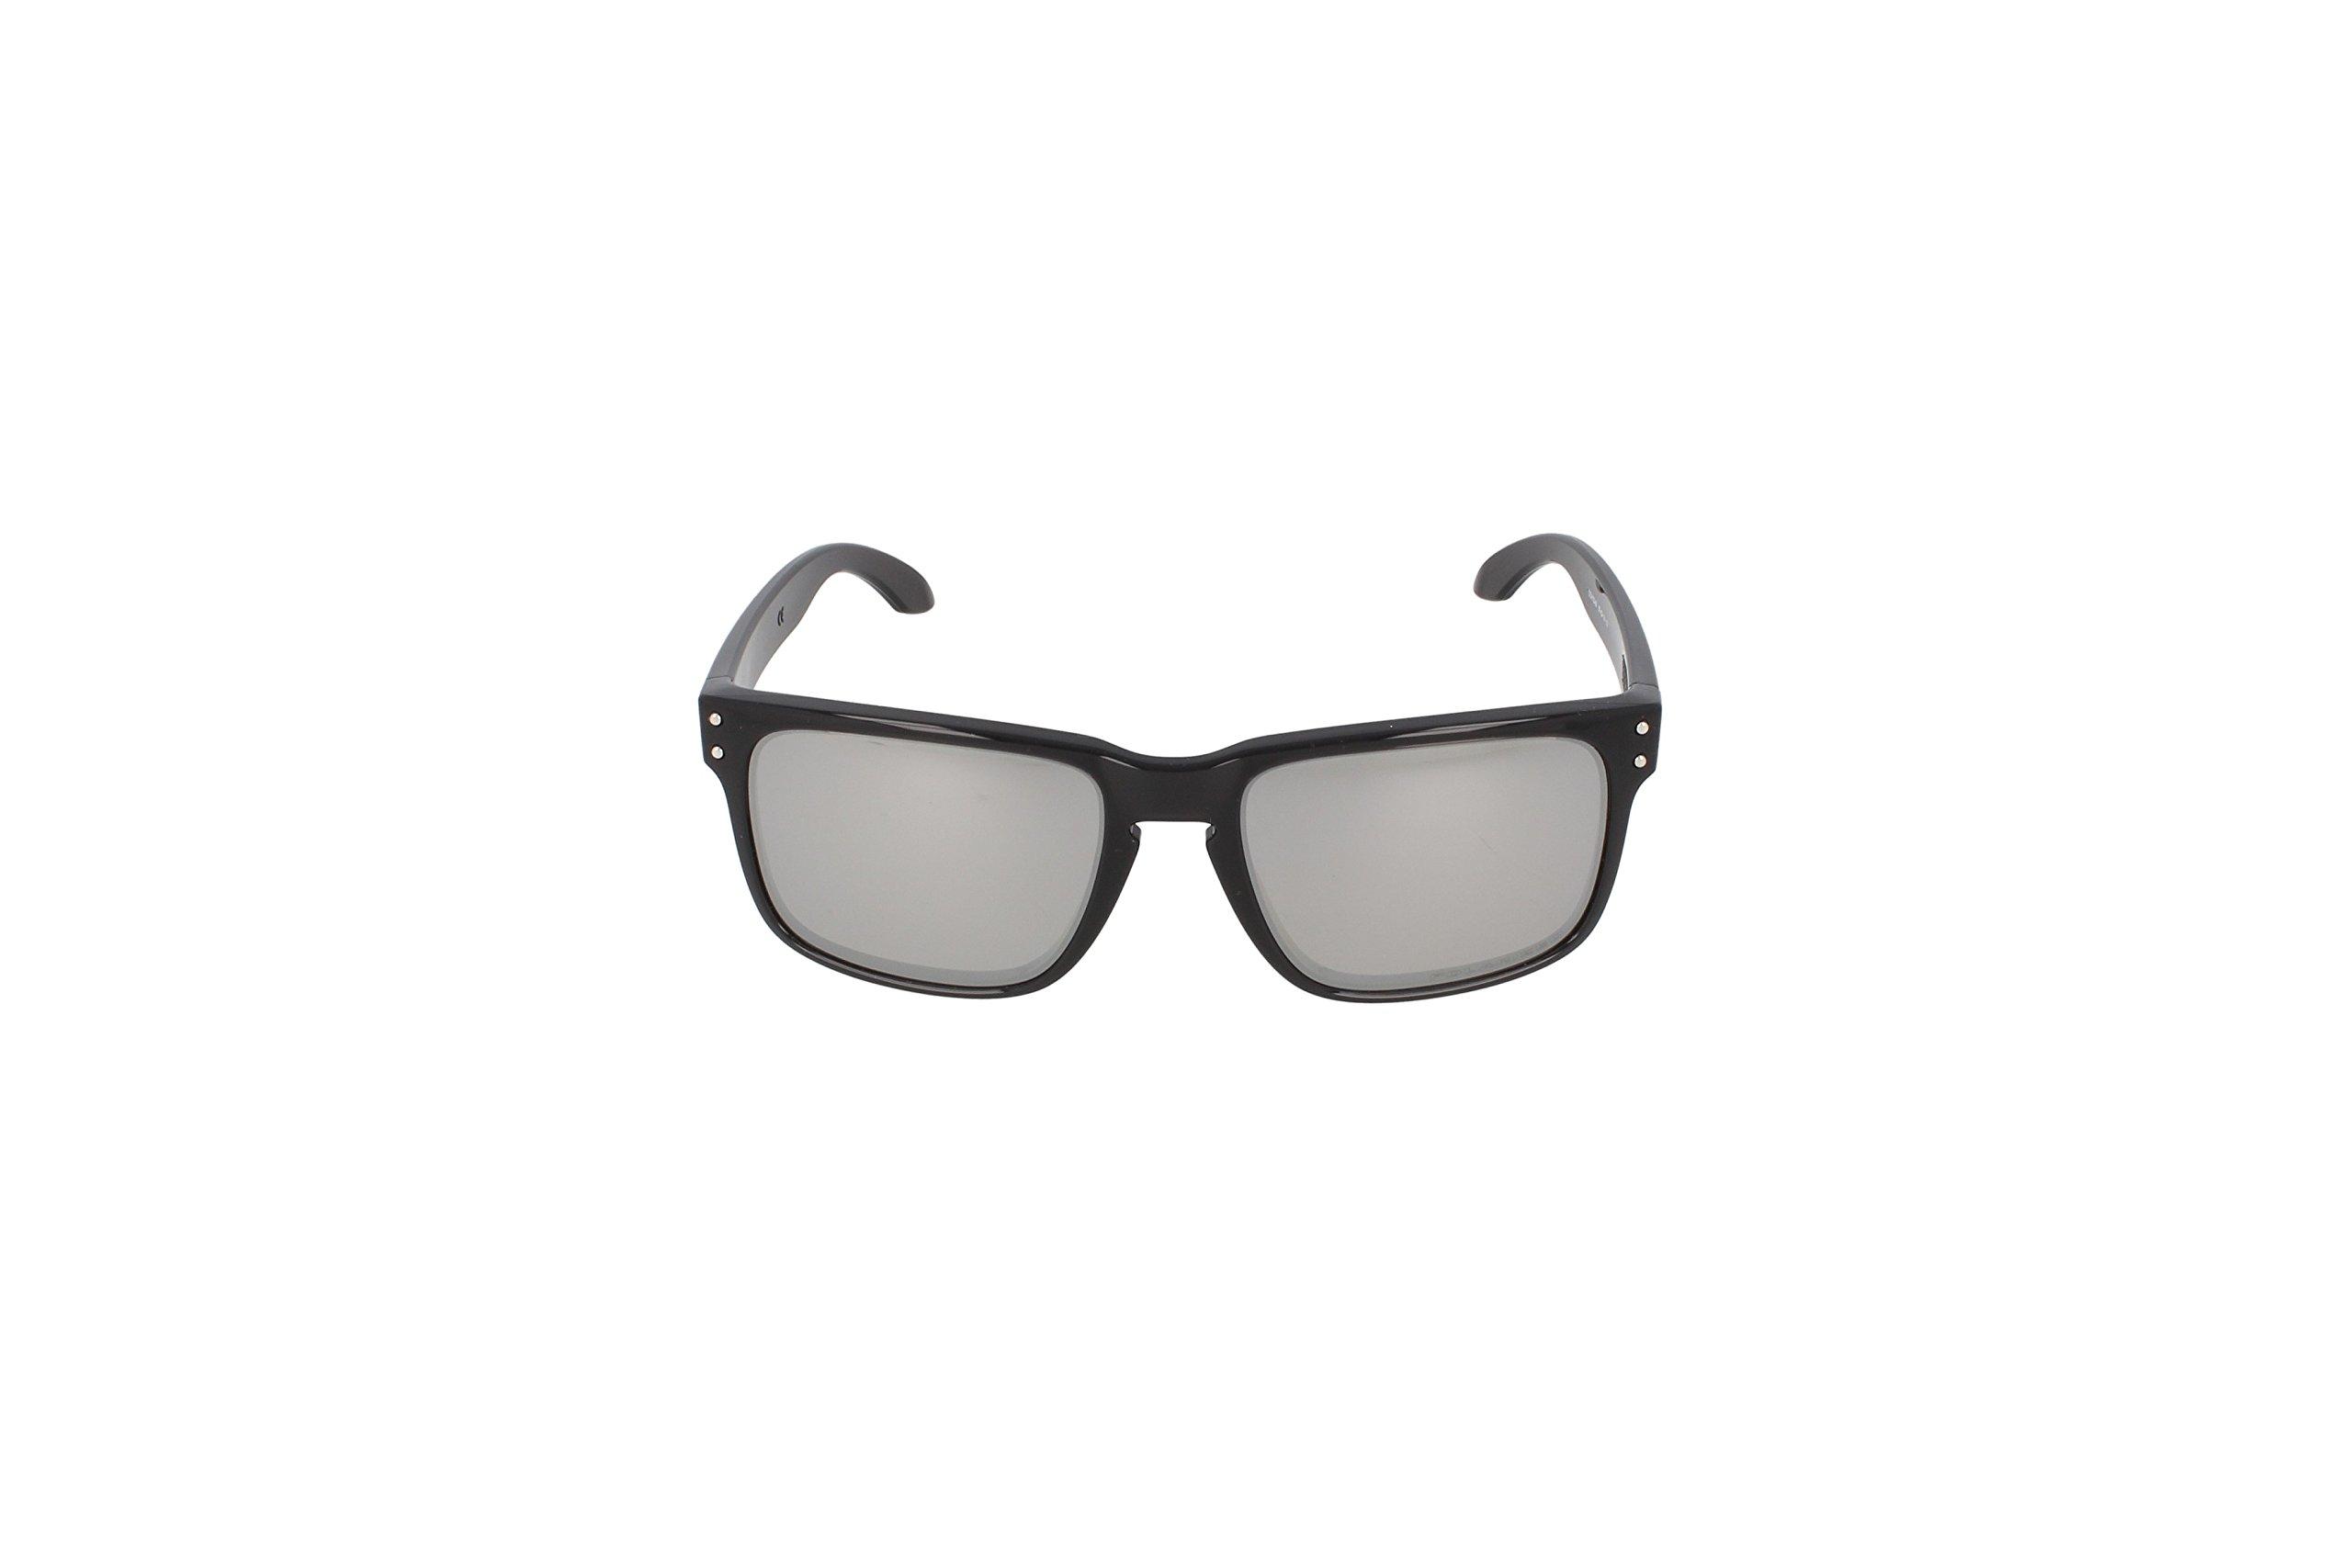 c7e1b33be5 Galleon - Oakley Sunglasses Holbrook Black Ink Collection Chrome Iridium  Polarized OO9102-68